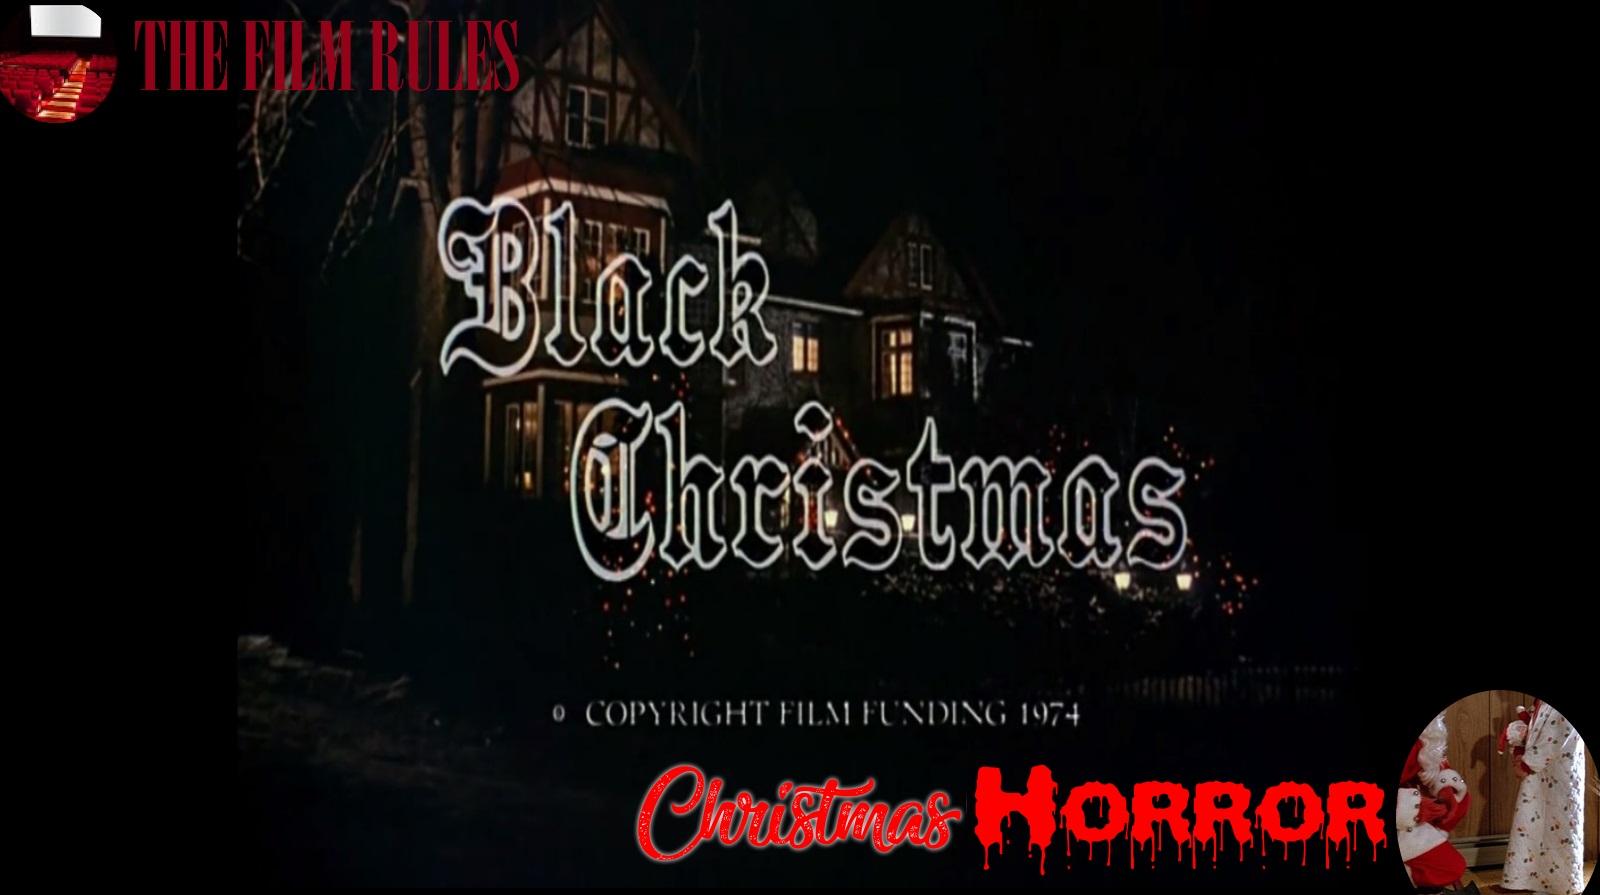 Black Christmas 1974.The Film Rules Christmas Horror Black Christmas 1974